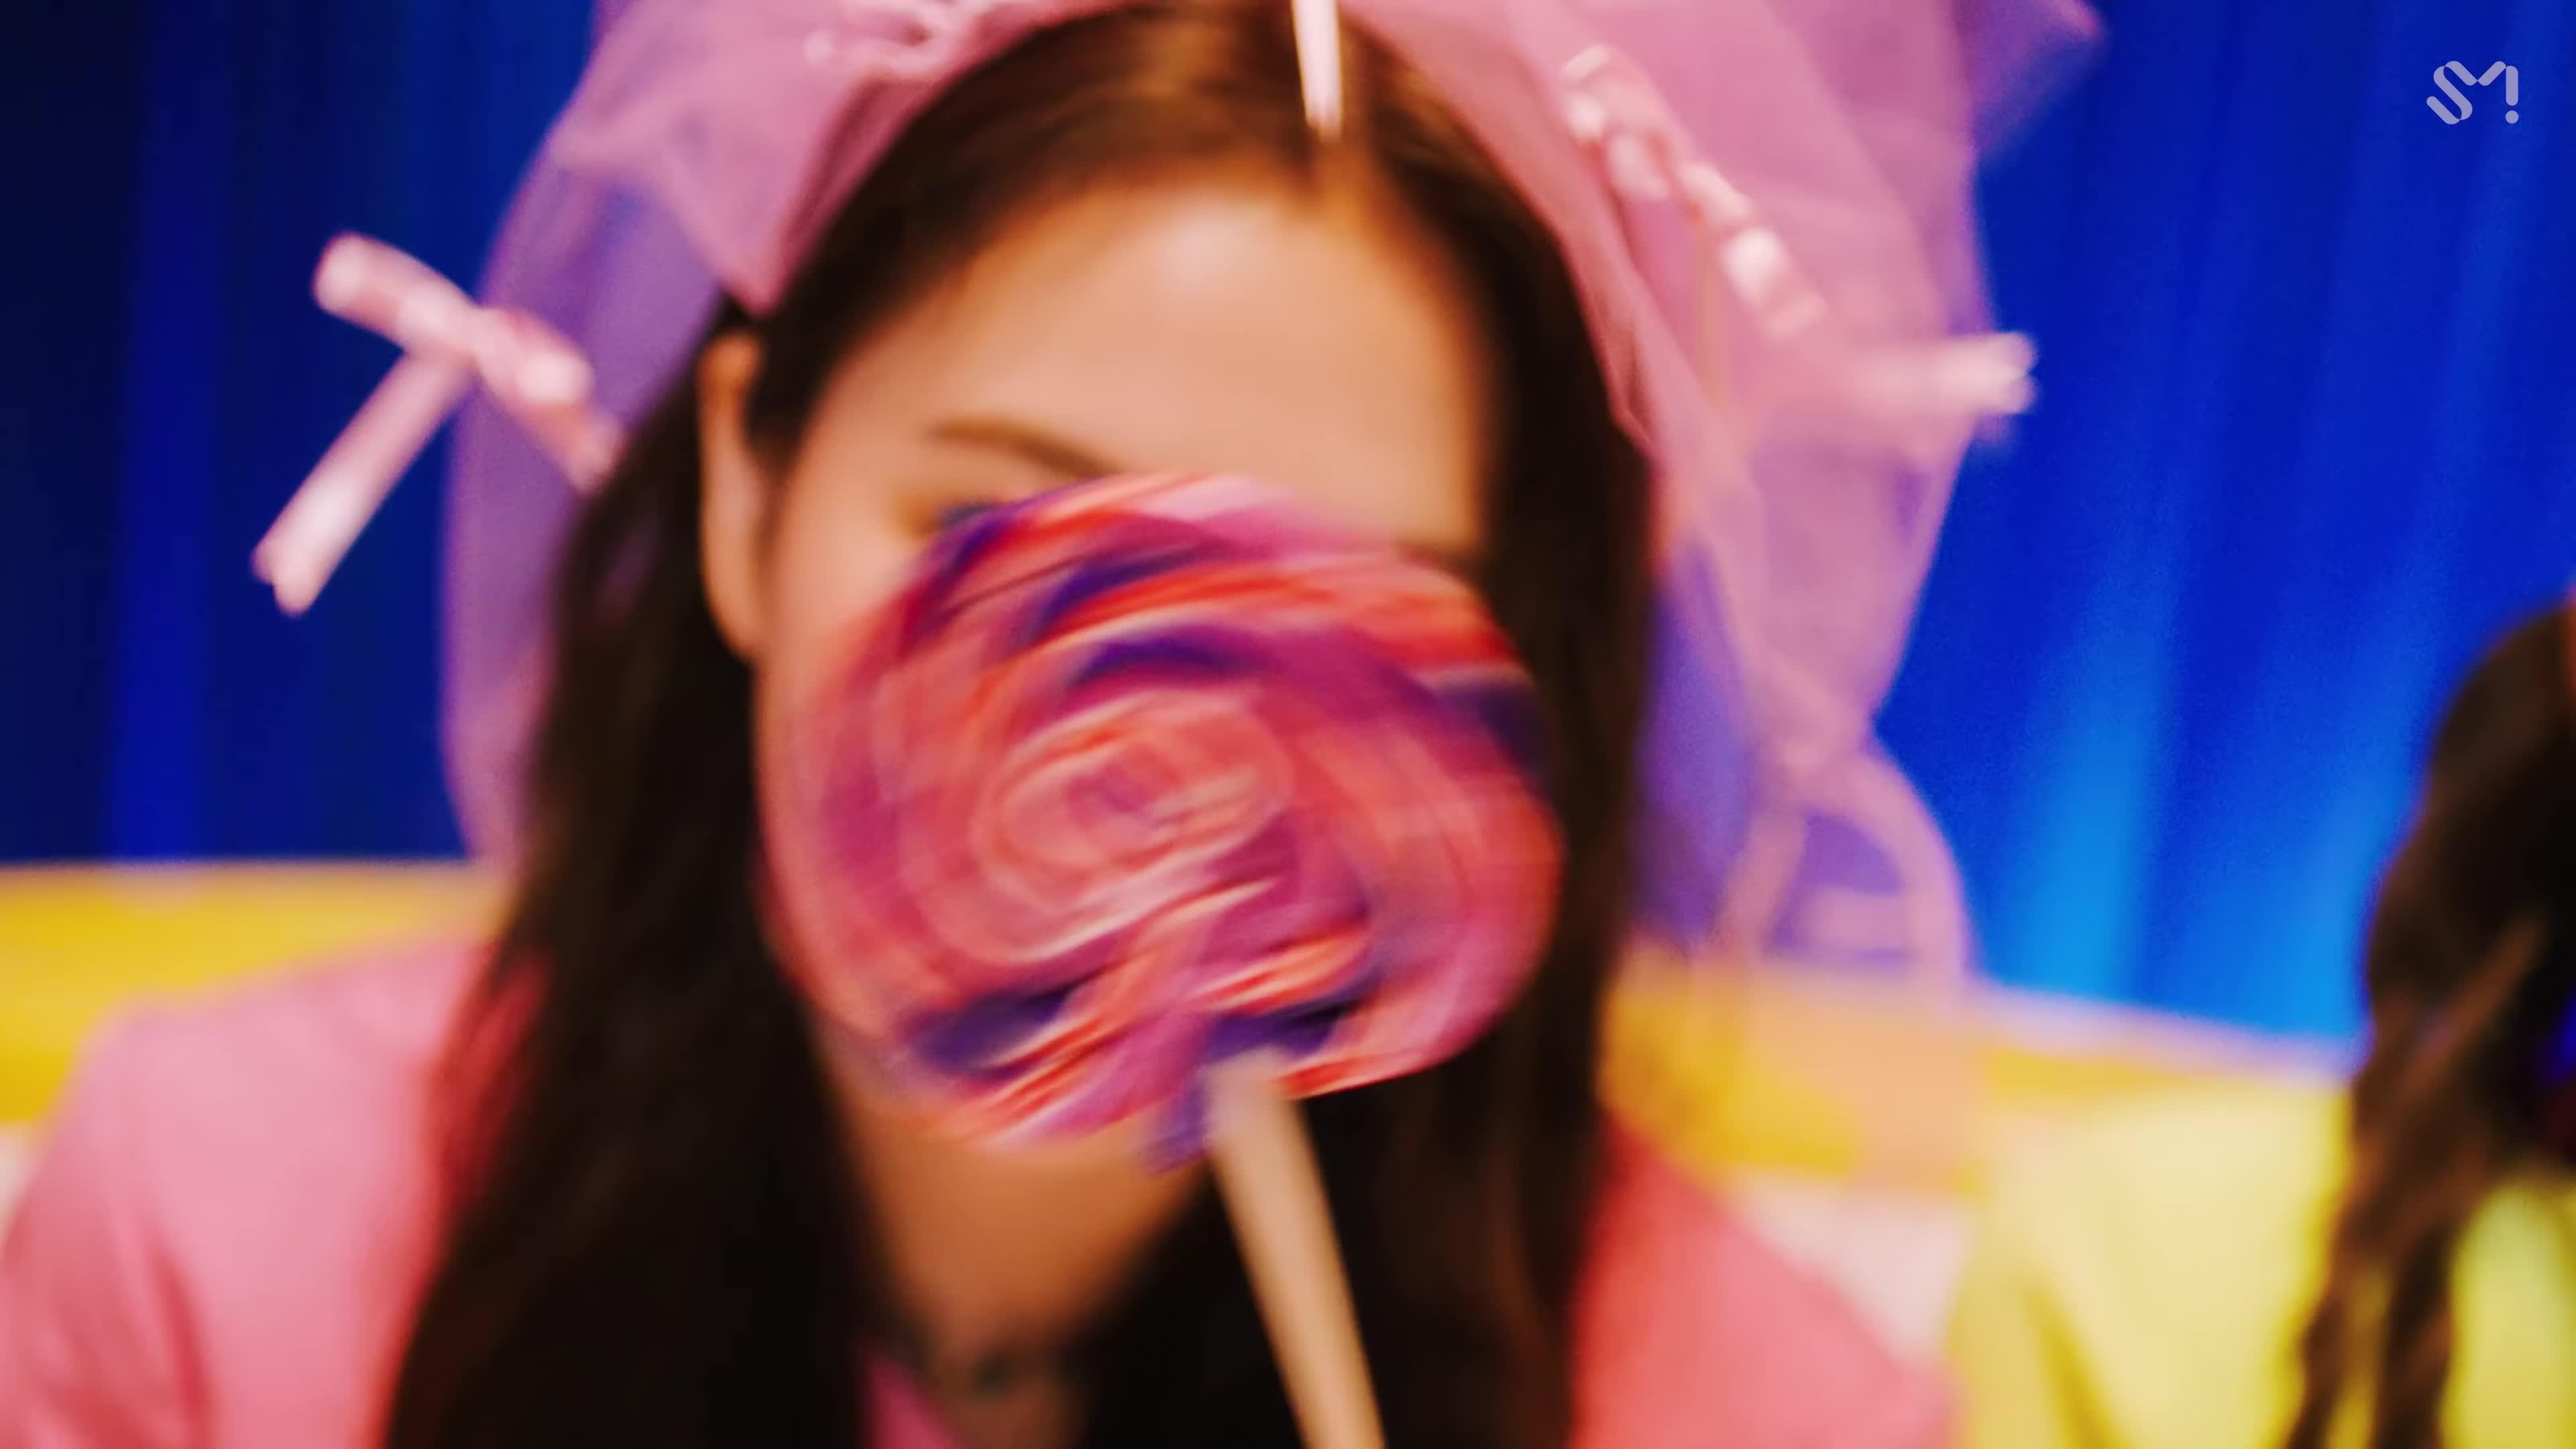 Day 1, IRENE, JOY, Music, Red Velvet, SEULGI, SMTOWN, The ReVe Festival, The ReVe Festival Eve, WENDY, YERI, Zimzalabim, 레드벨벳, 슬기, 아이린, 예리, 웬디, 조이, 짐살라빔, Red Velvet 레드벨벳 '짐살라빔 (Zimzalabim)' MV Teaser :